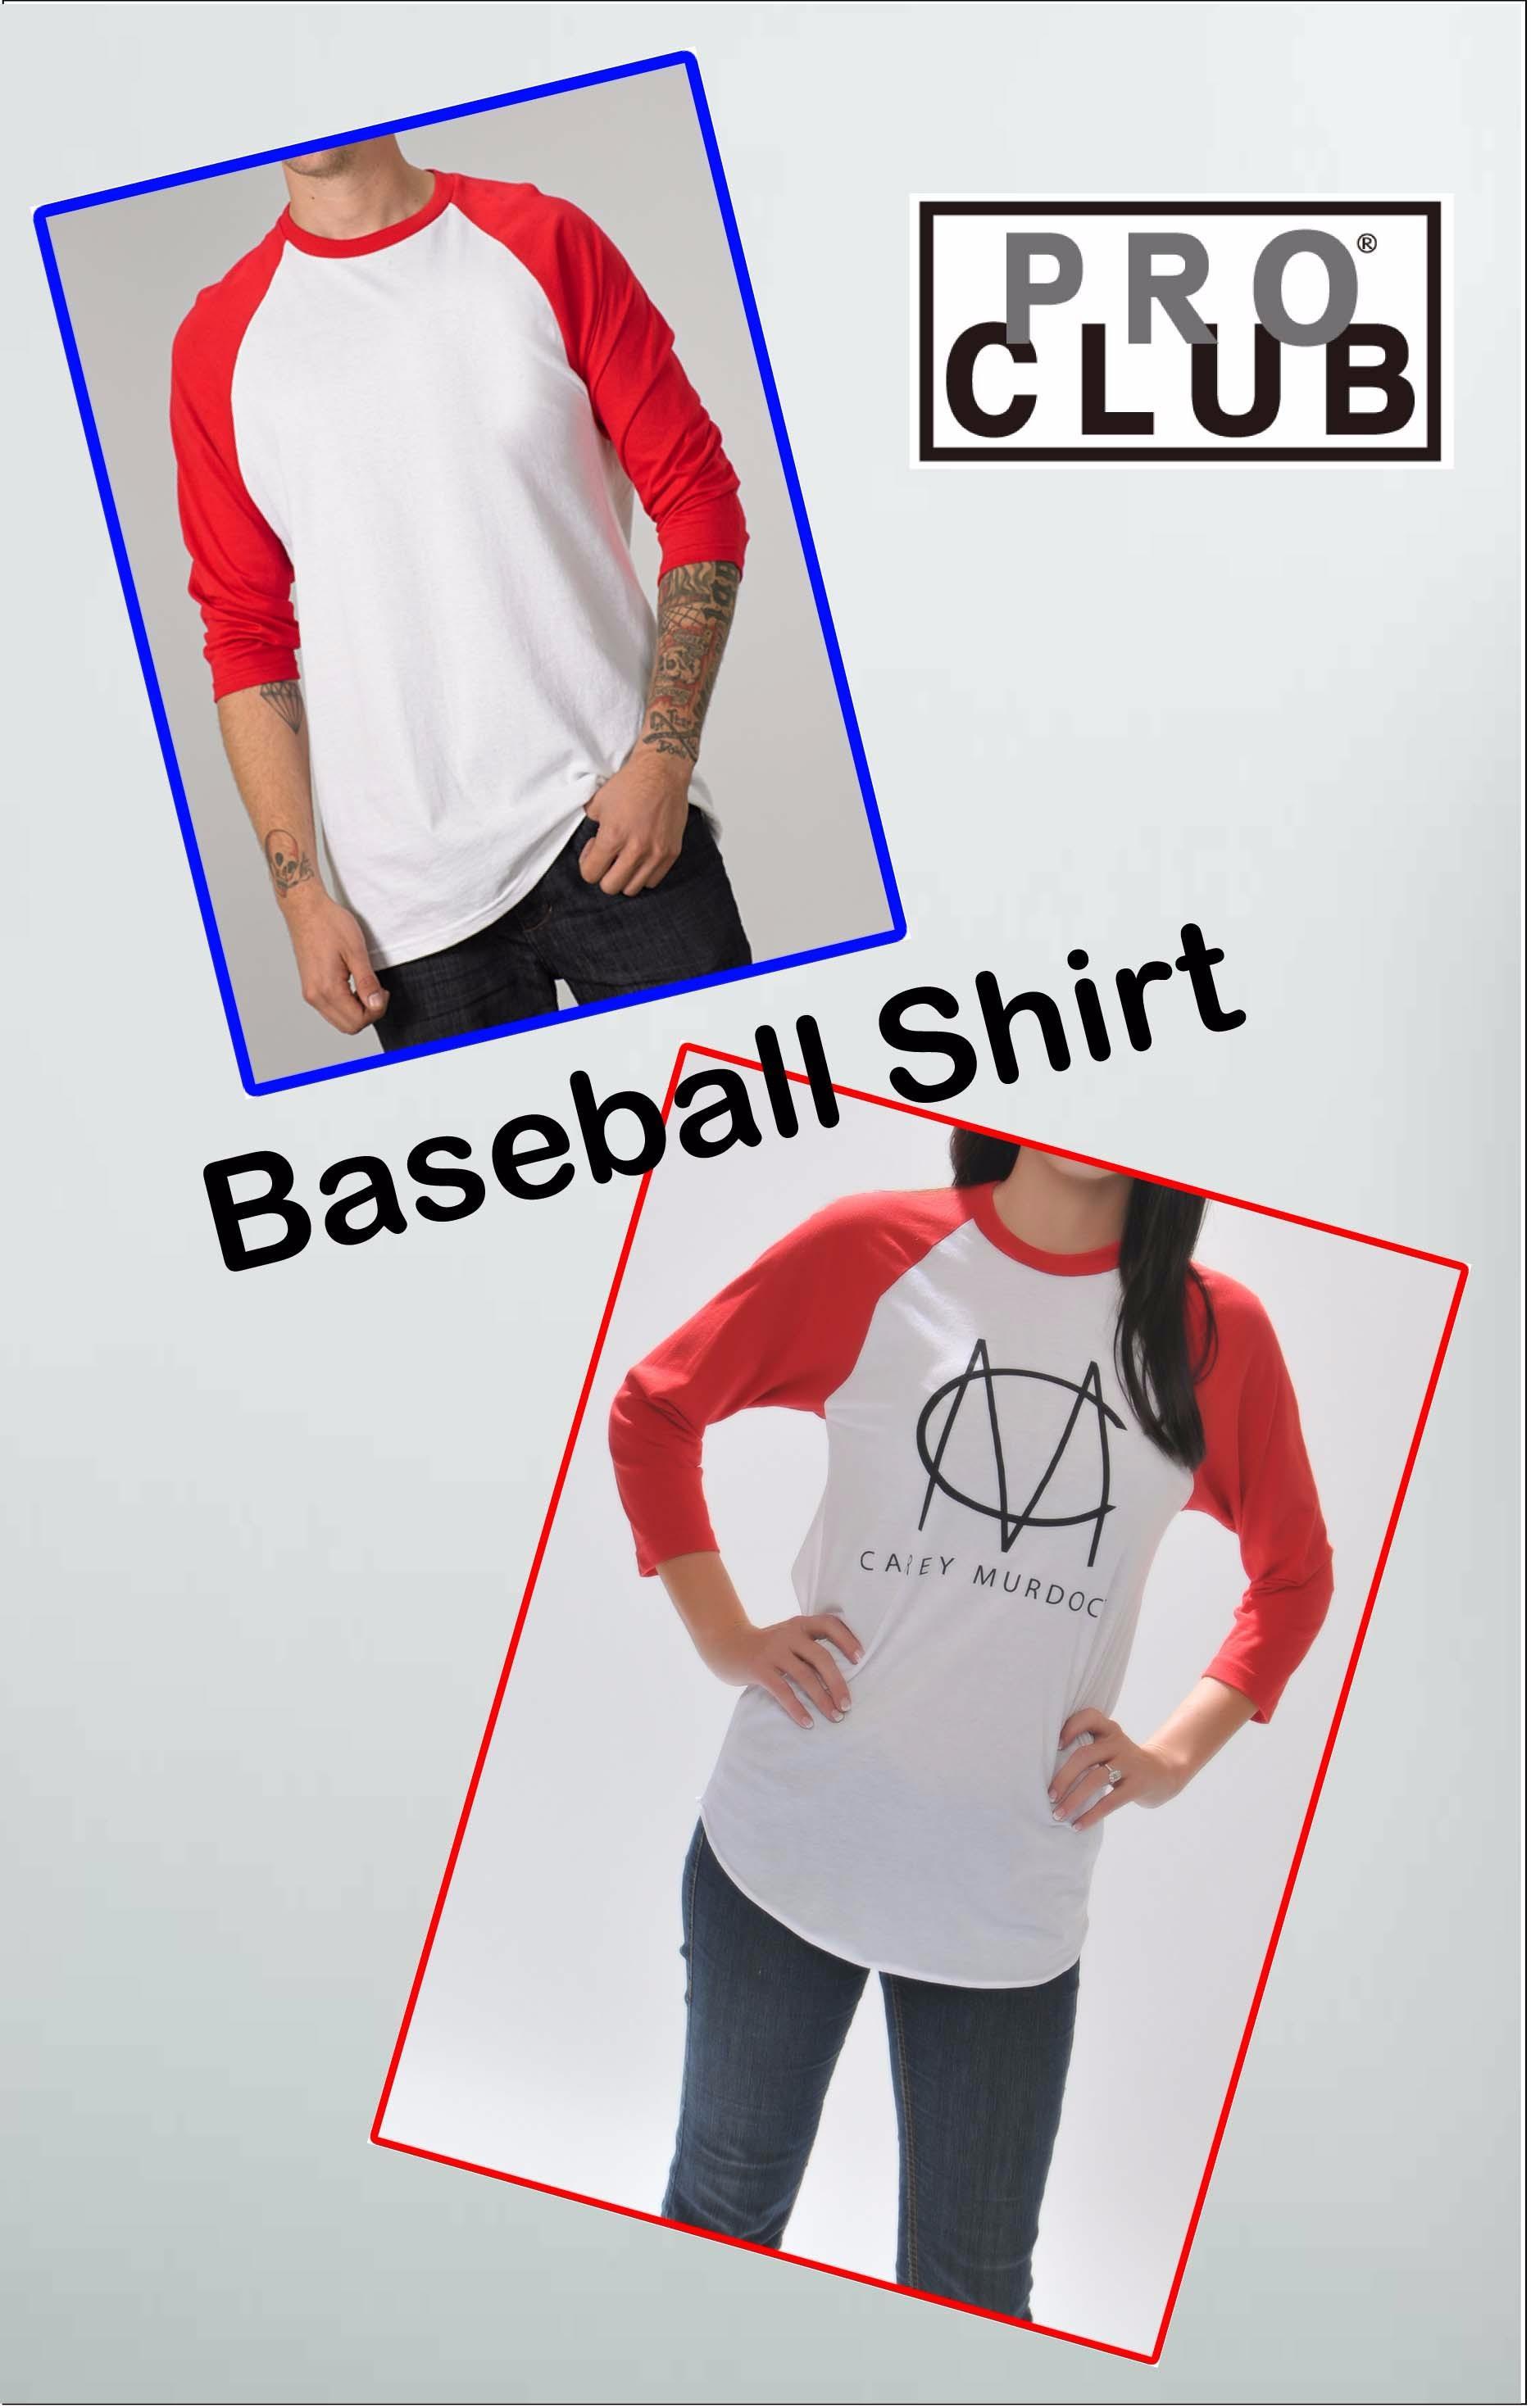 wholesale t shirts N image 14